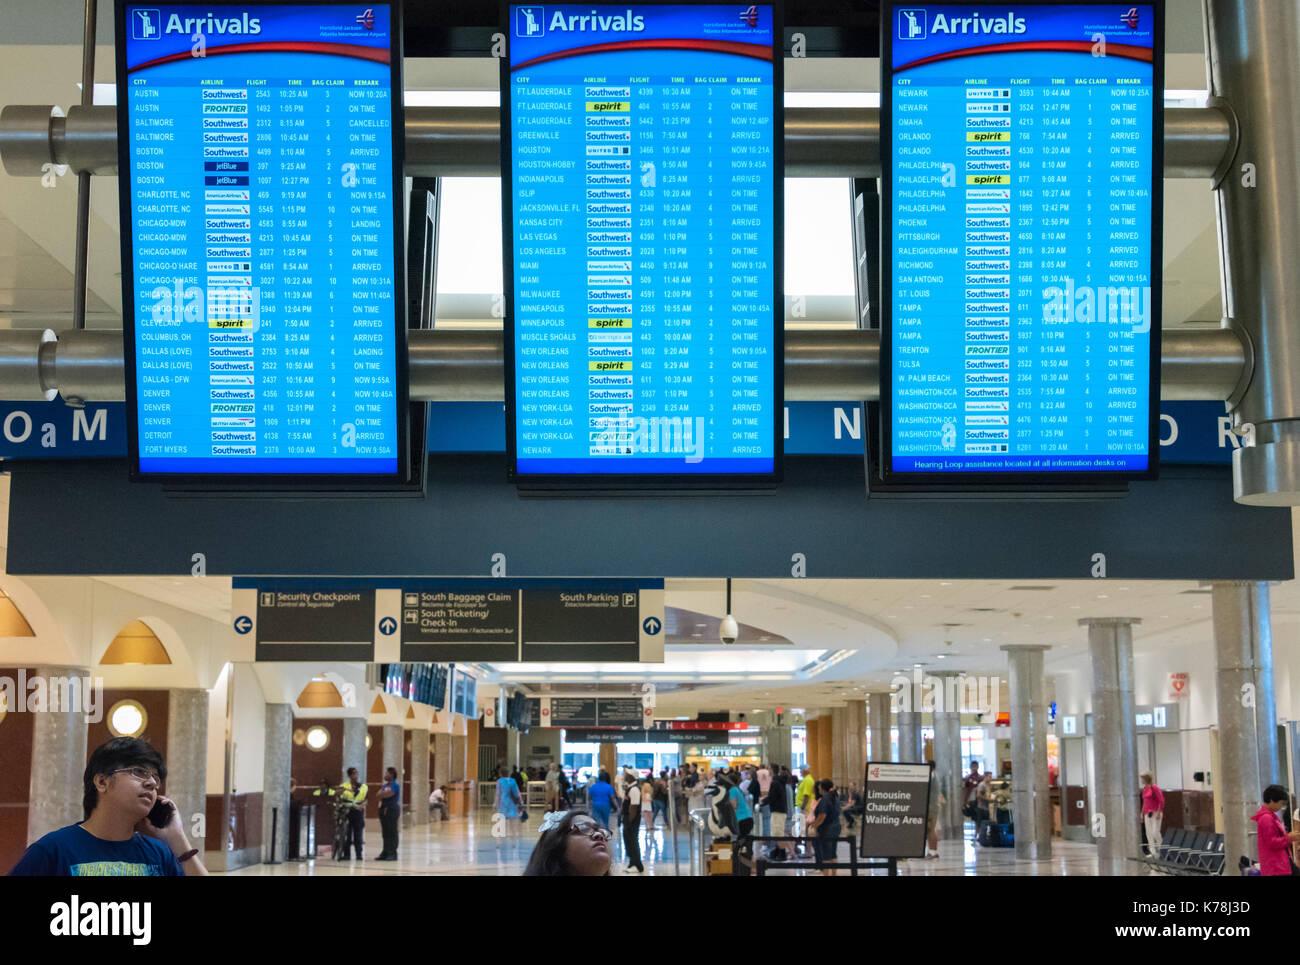 People checking flight arrival display boards at Hartsfield-Jackson Atlanta International Airport in Atlanta, Georgia. - Stock Image